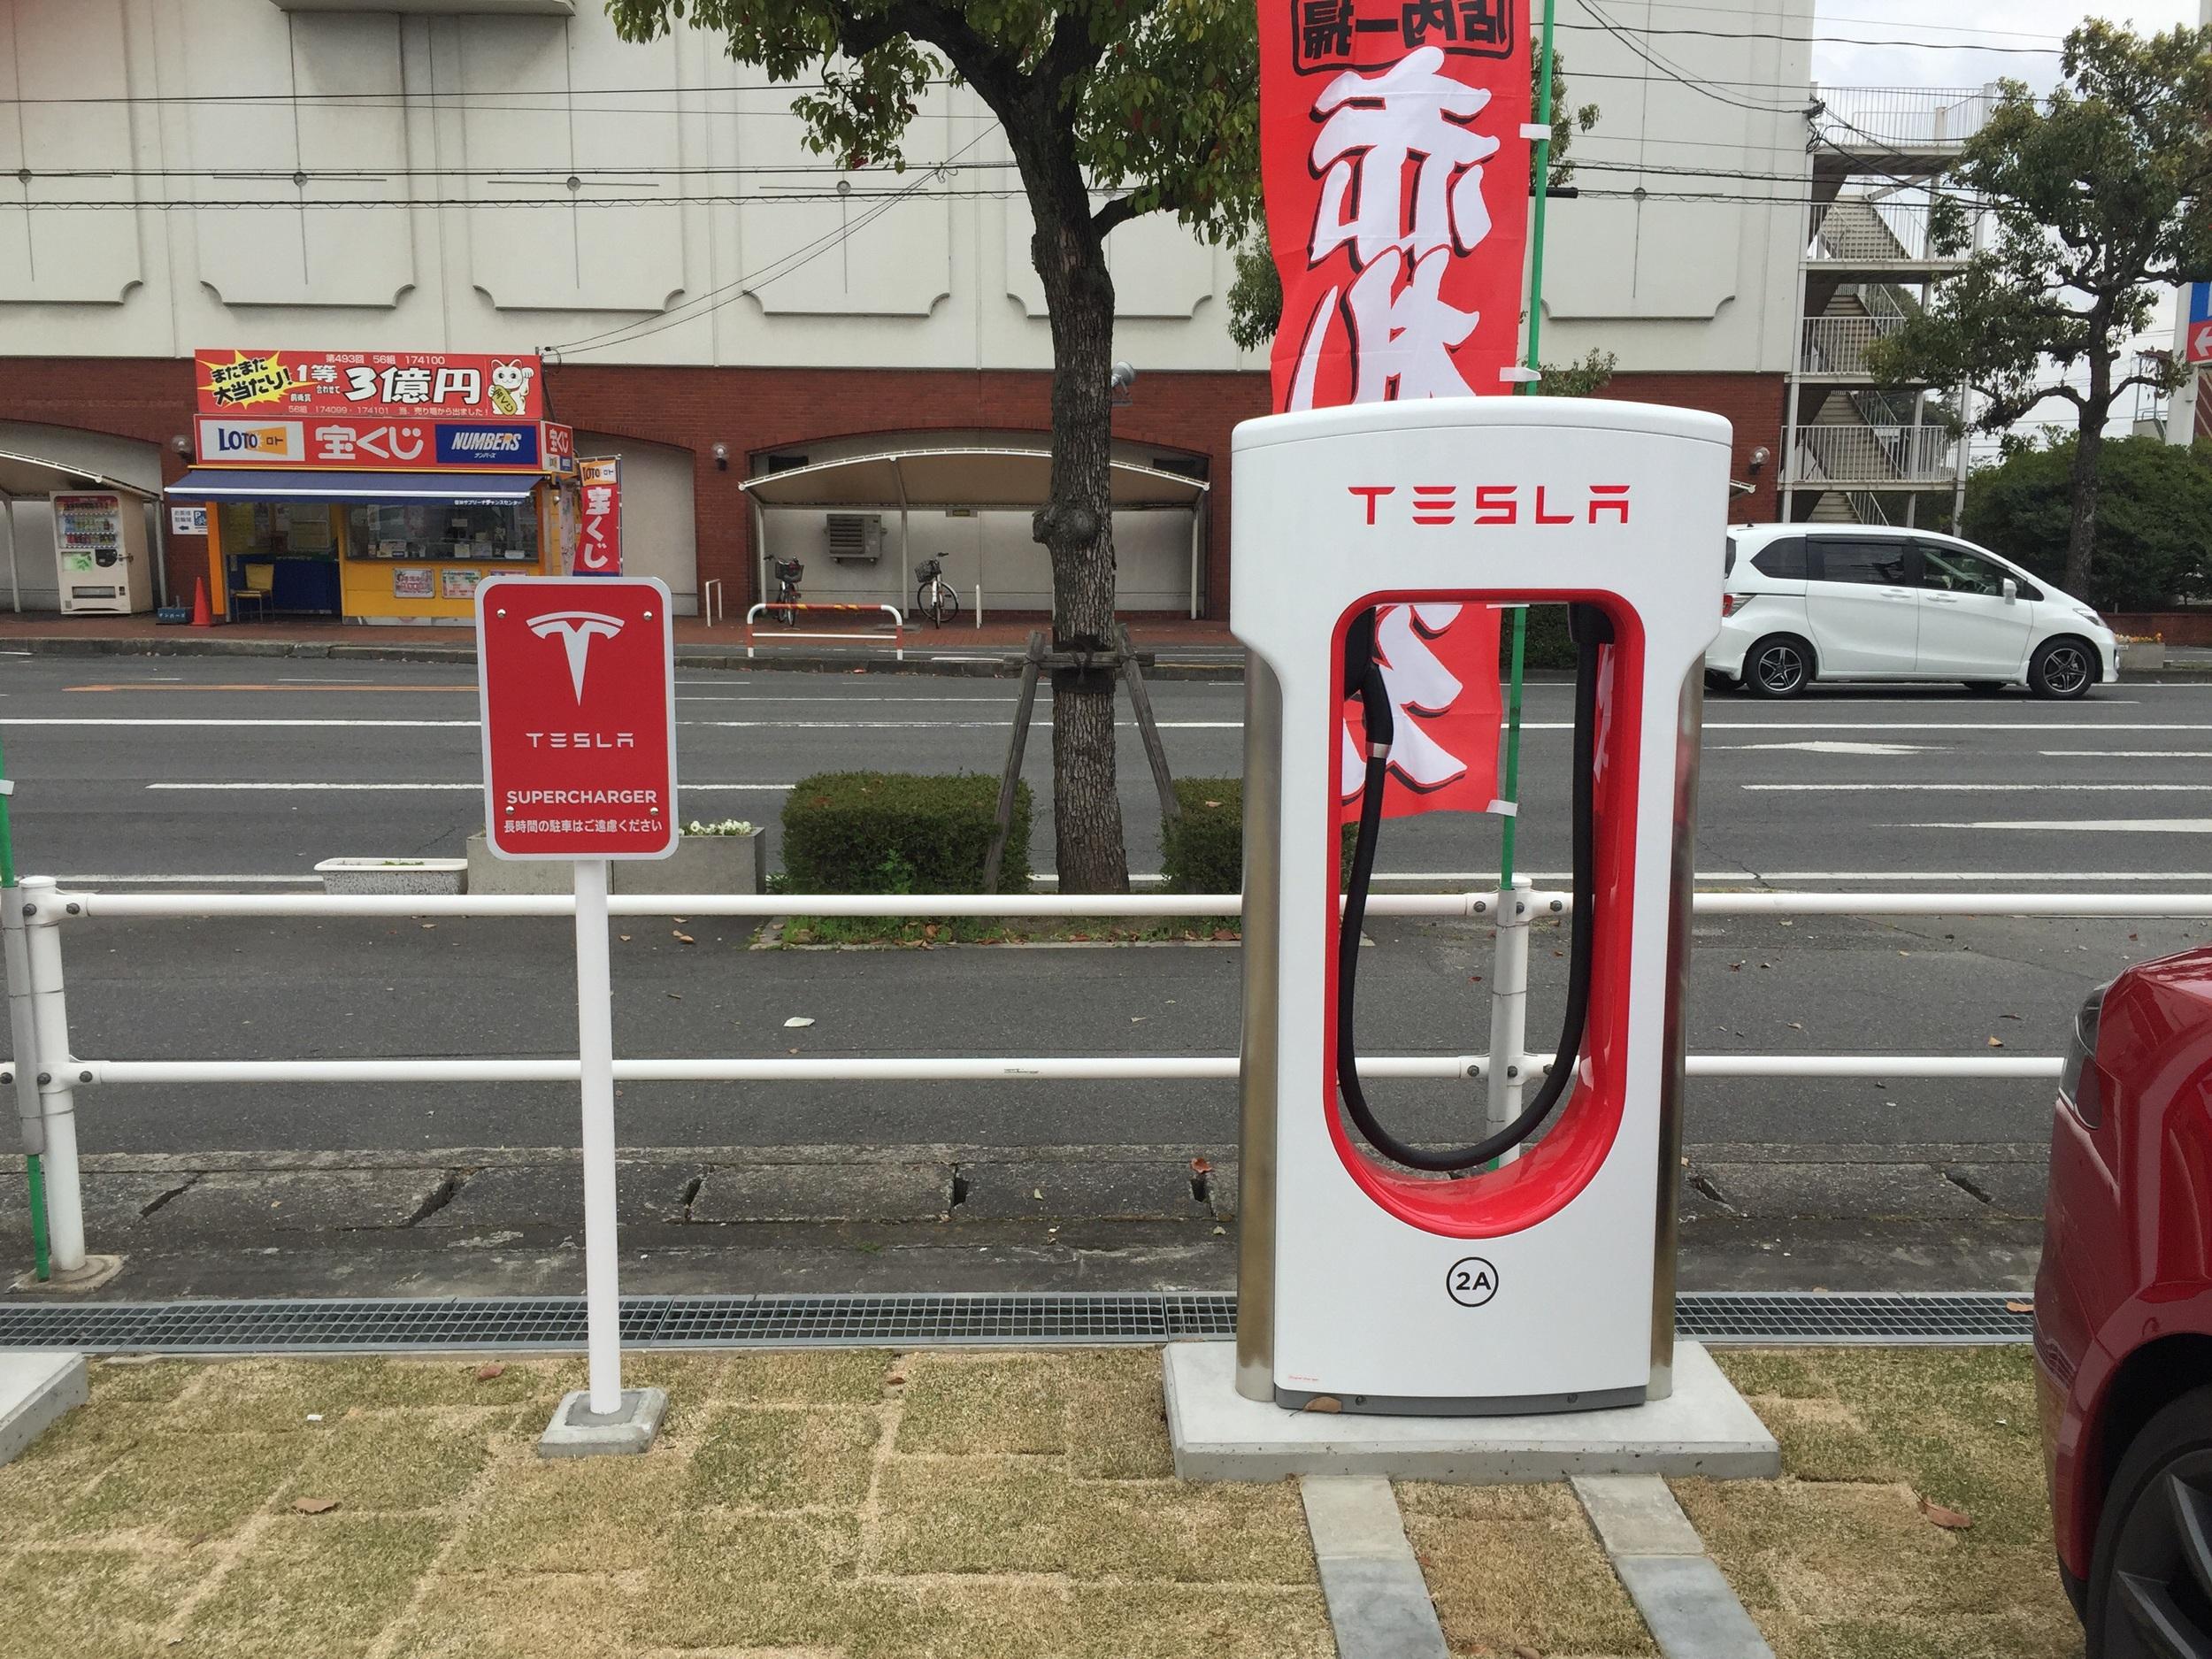 Tesla signage and Supercharger